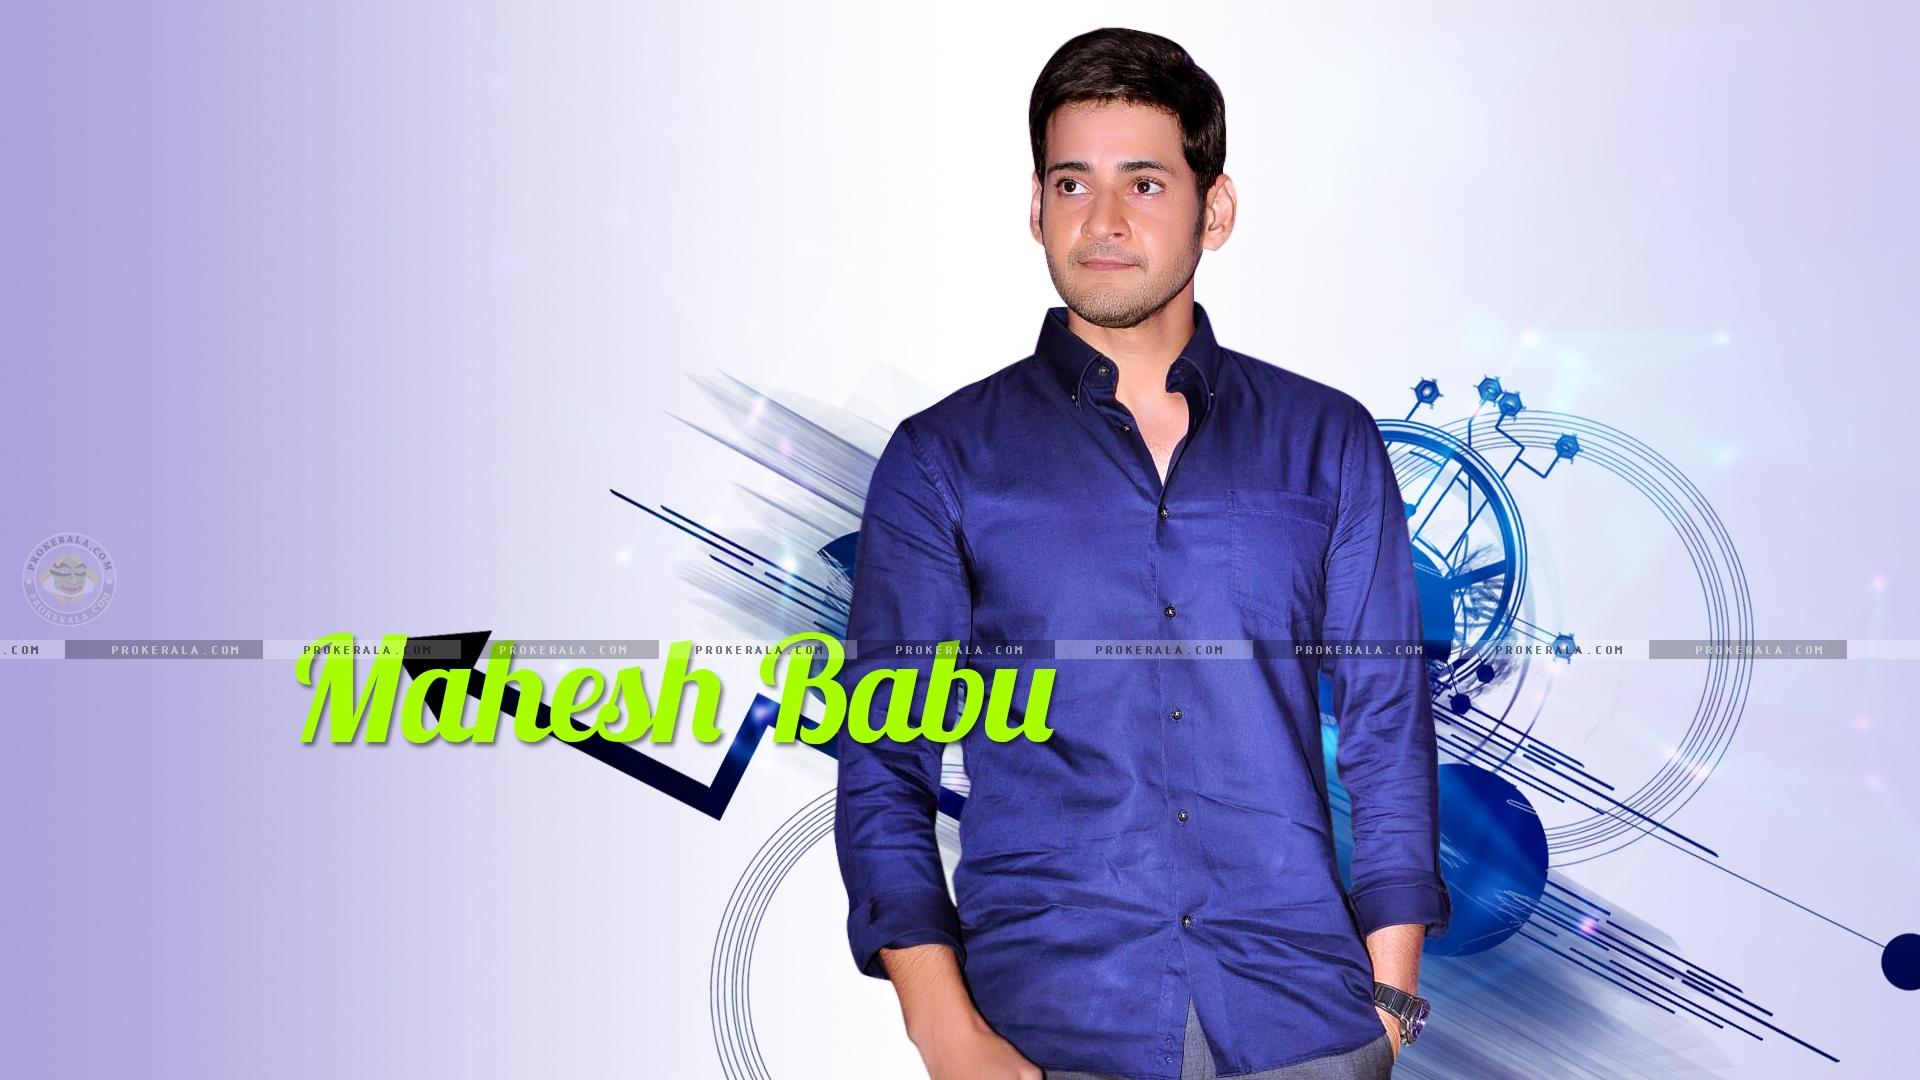 Mahesh Babu Wallpapers Hd